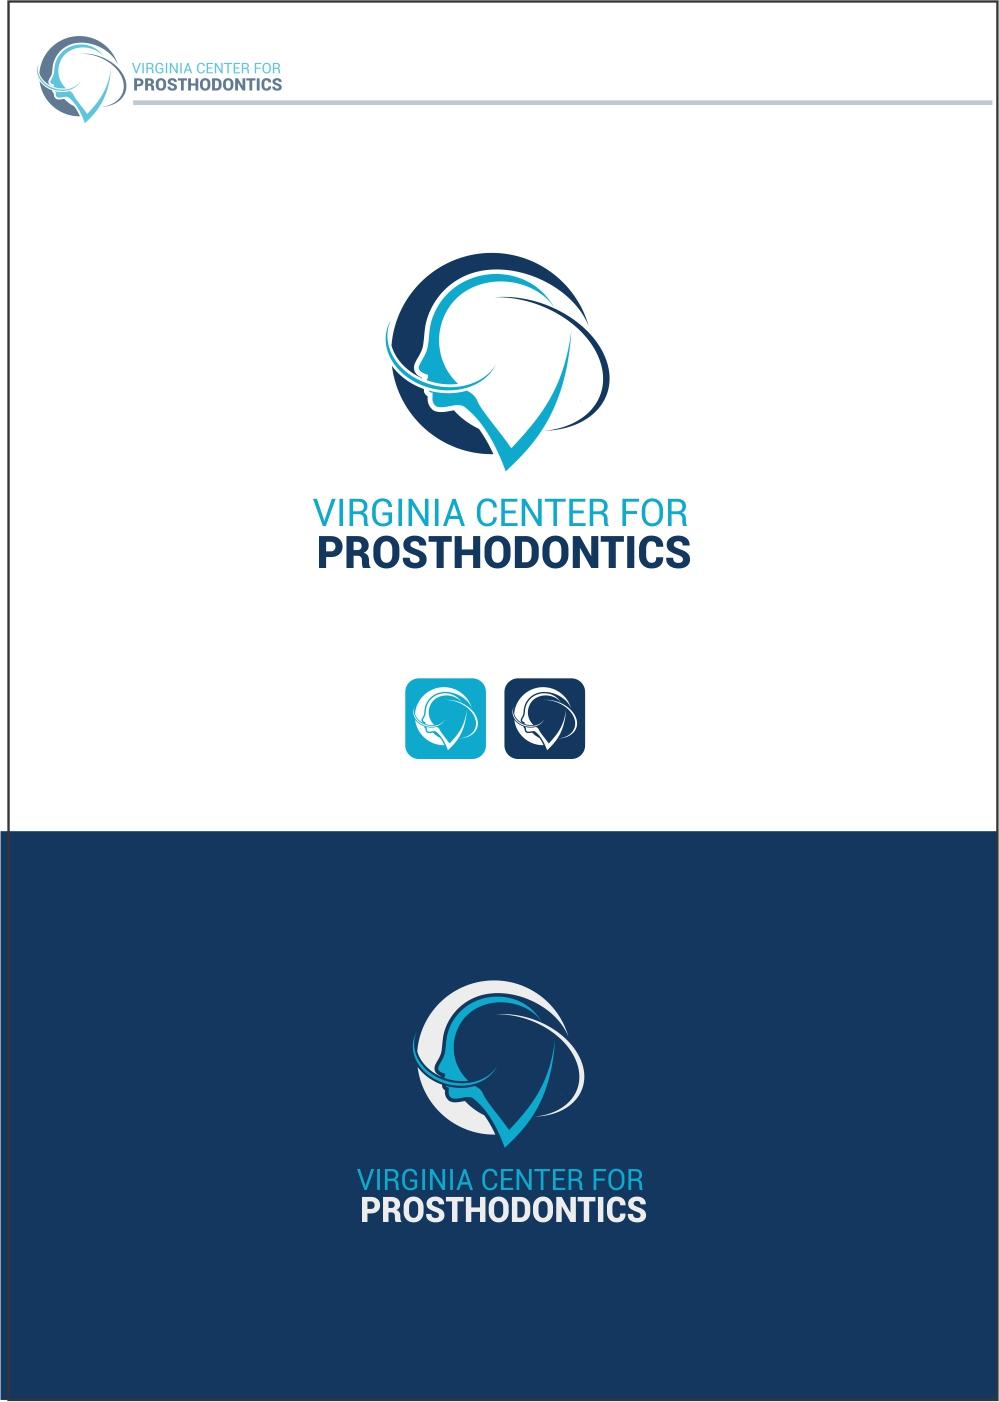 Logo Design by ian69 - Entry No. 85 in the Logo Design Contest Imaginative Logo Design for Virginia Center for Prosthodontics.